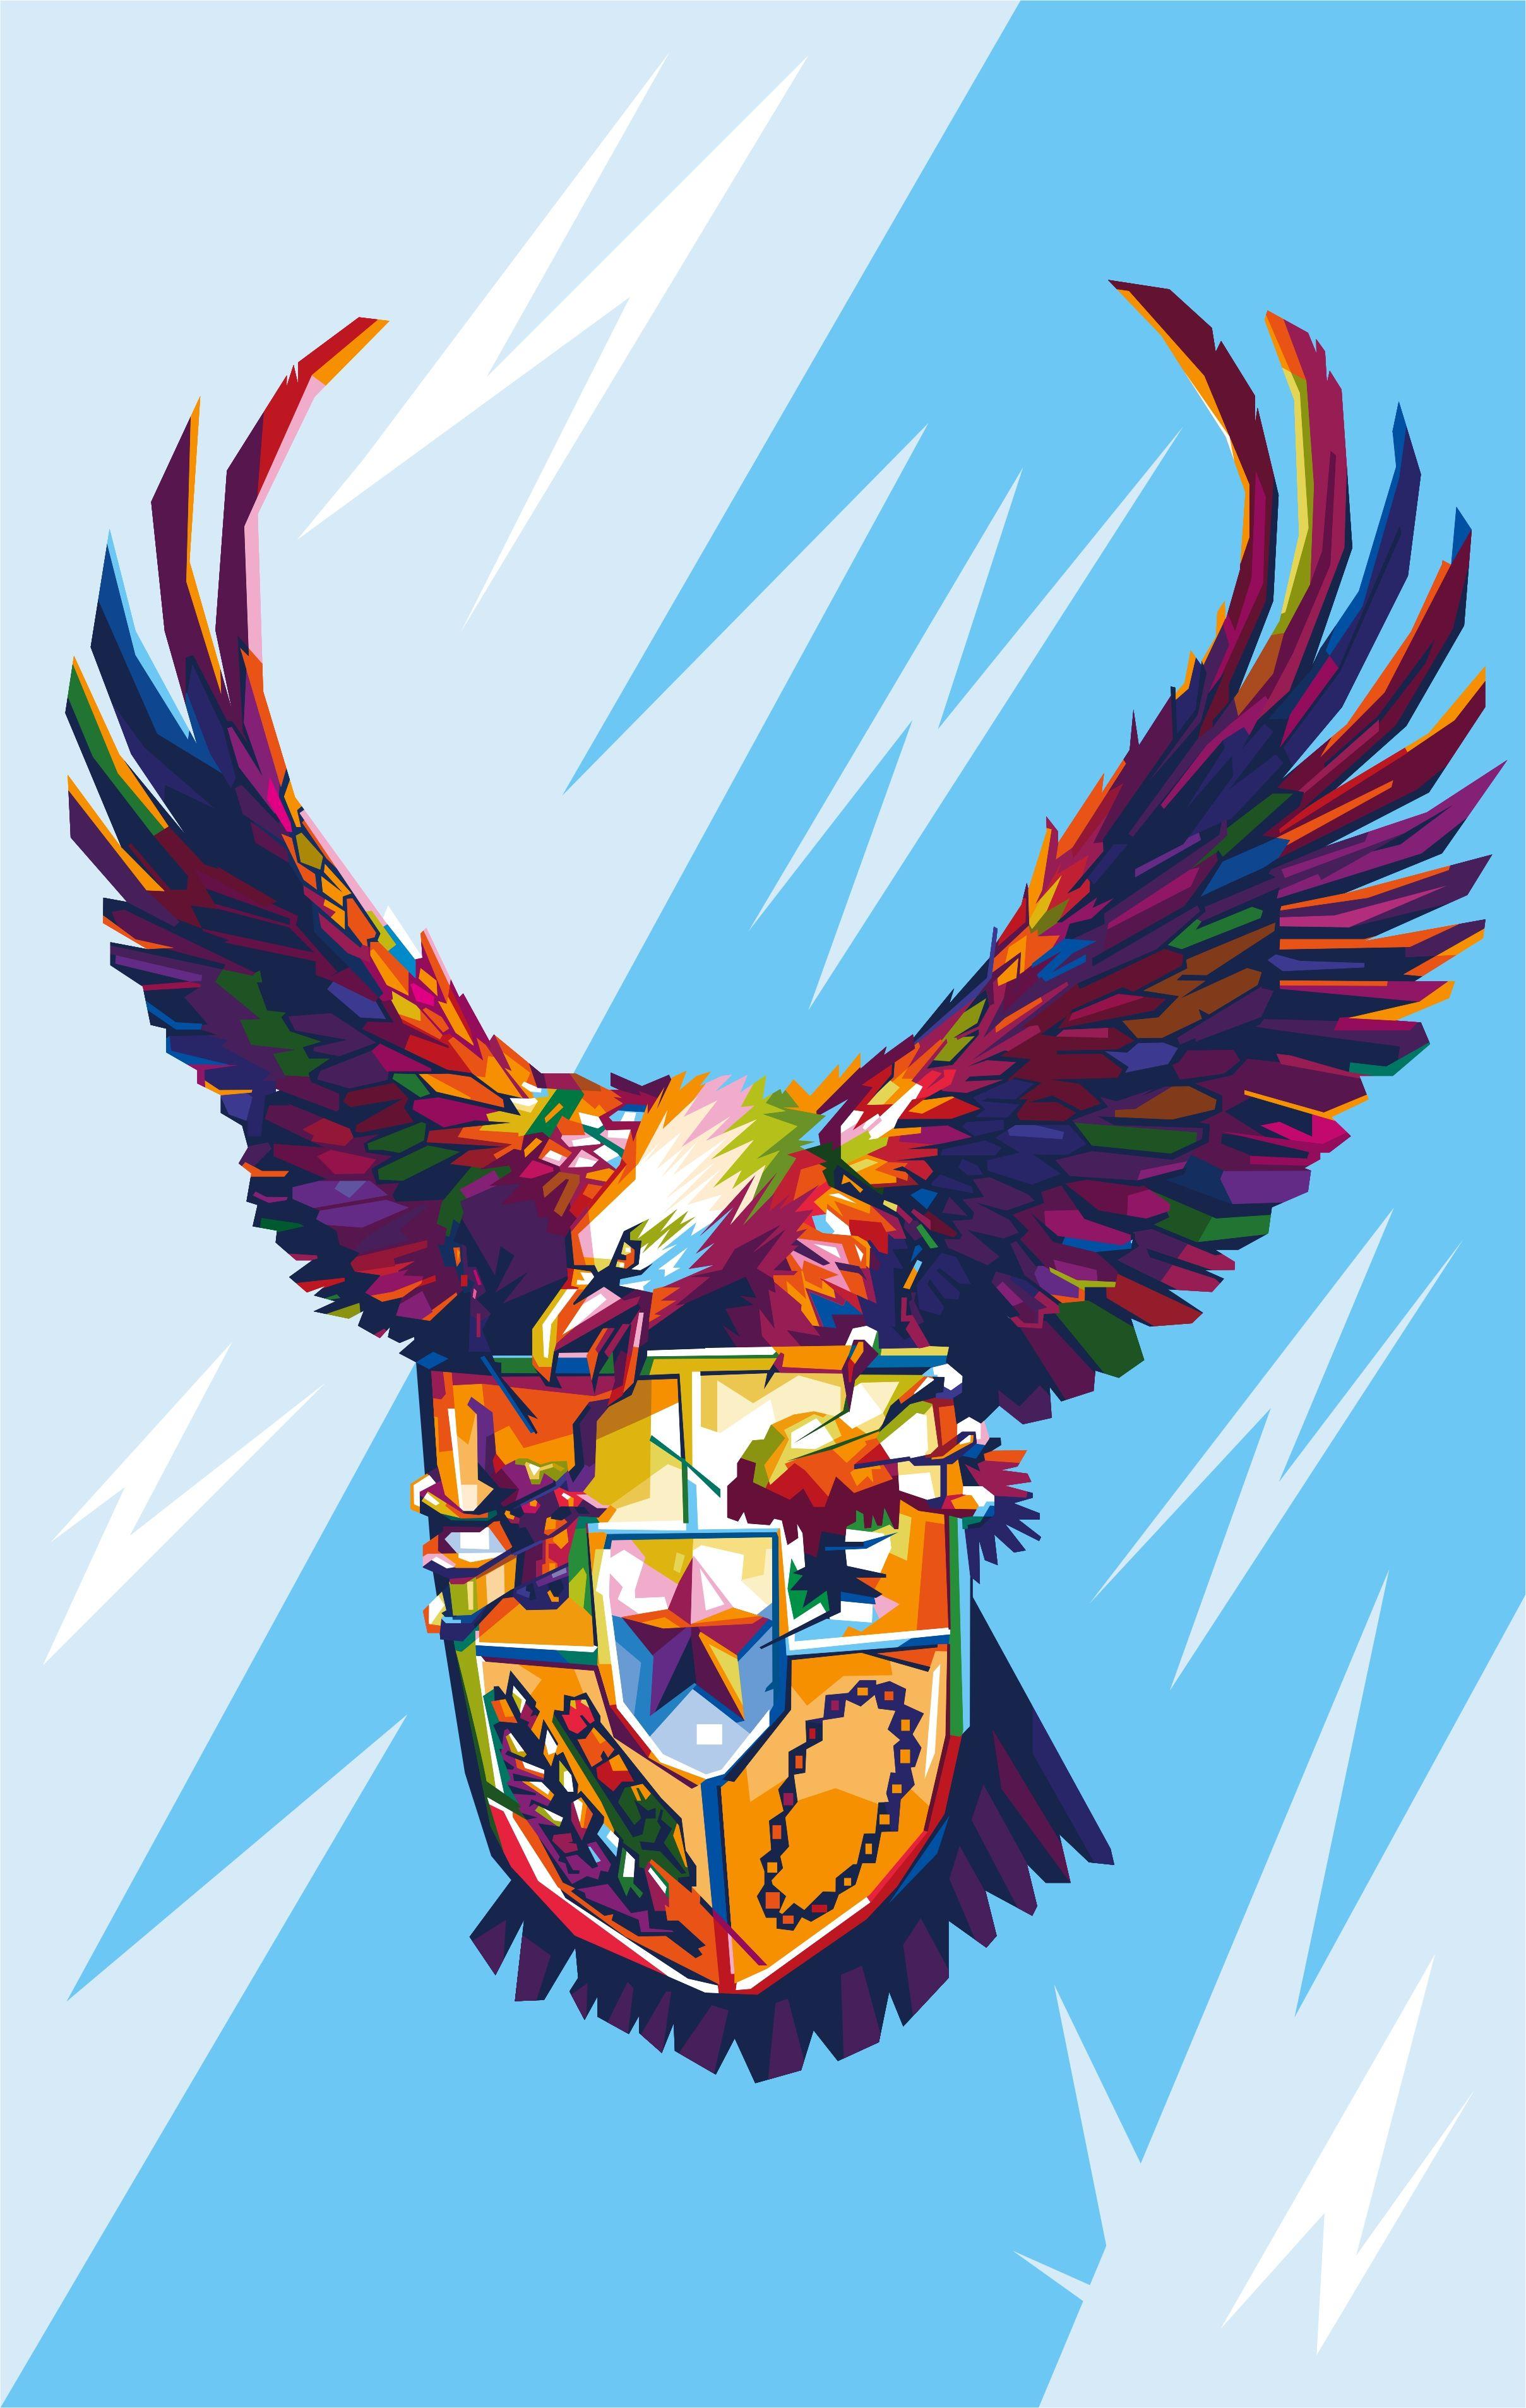 garuda pancasila in wpap pop art s style di 2020 karya seni 3d tato burung hantu seni 3d garuda pancasila in wpap pop art s